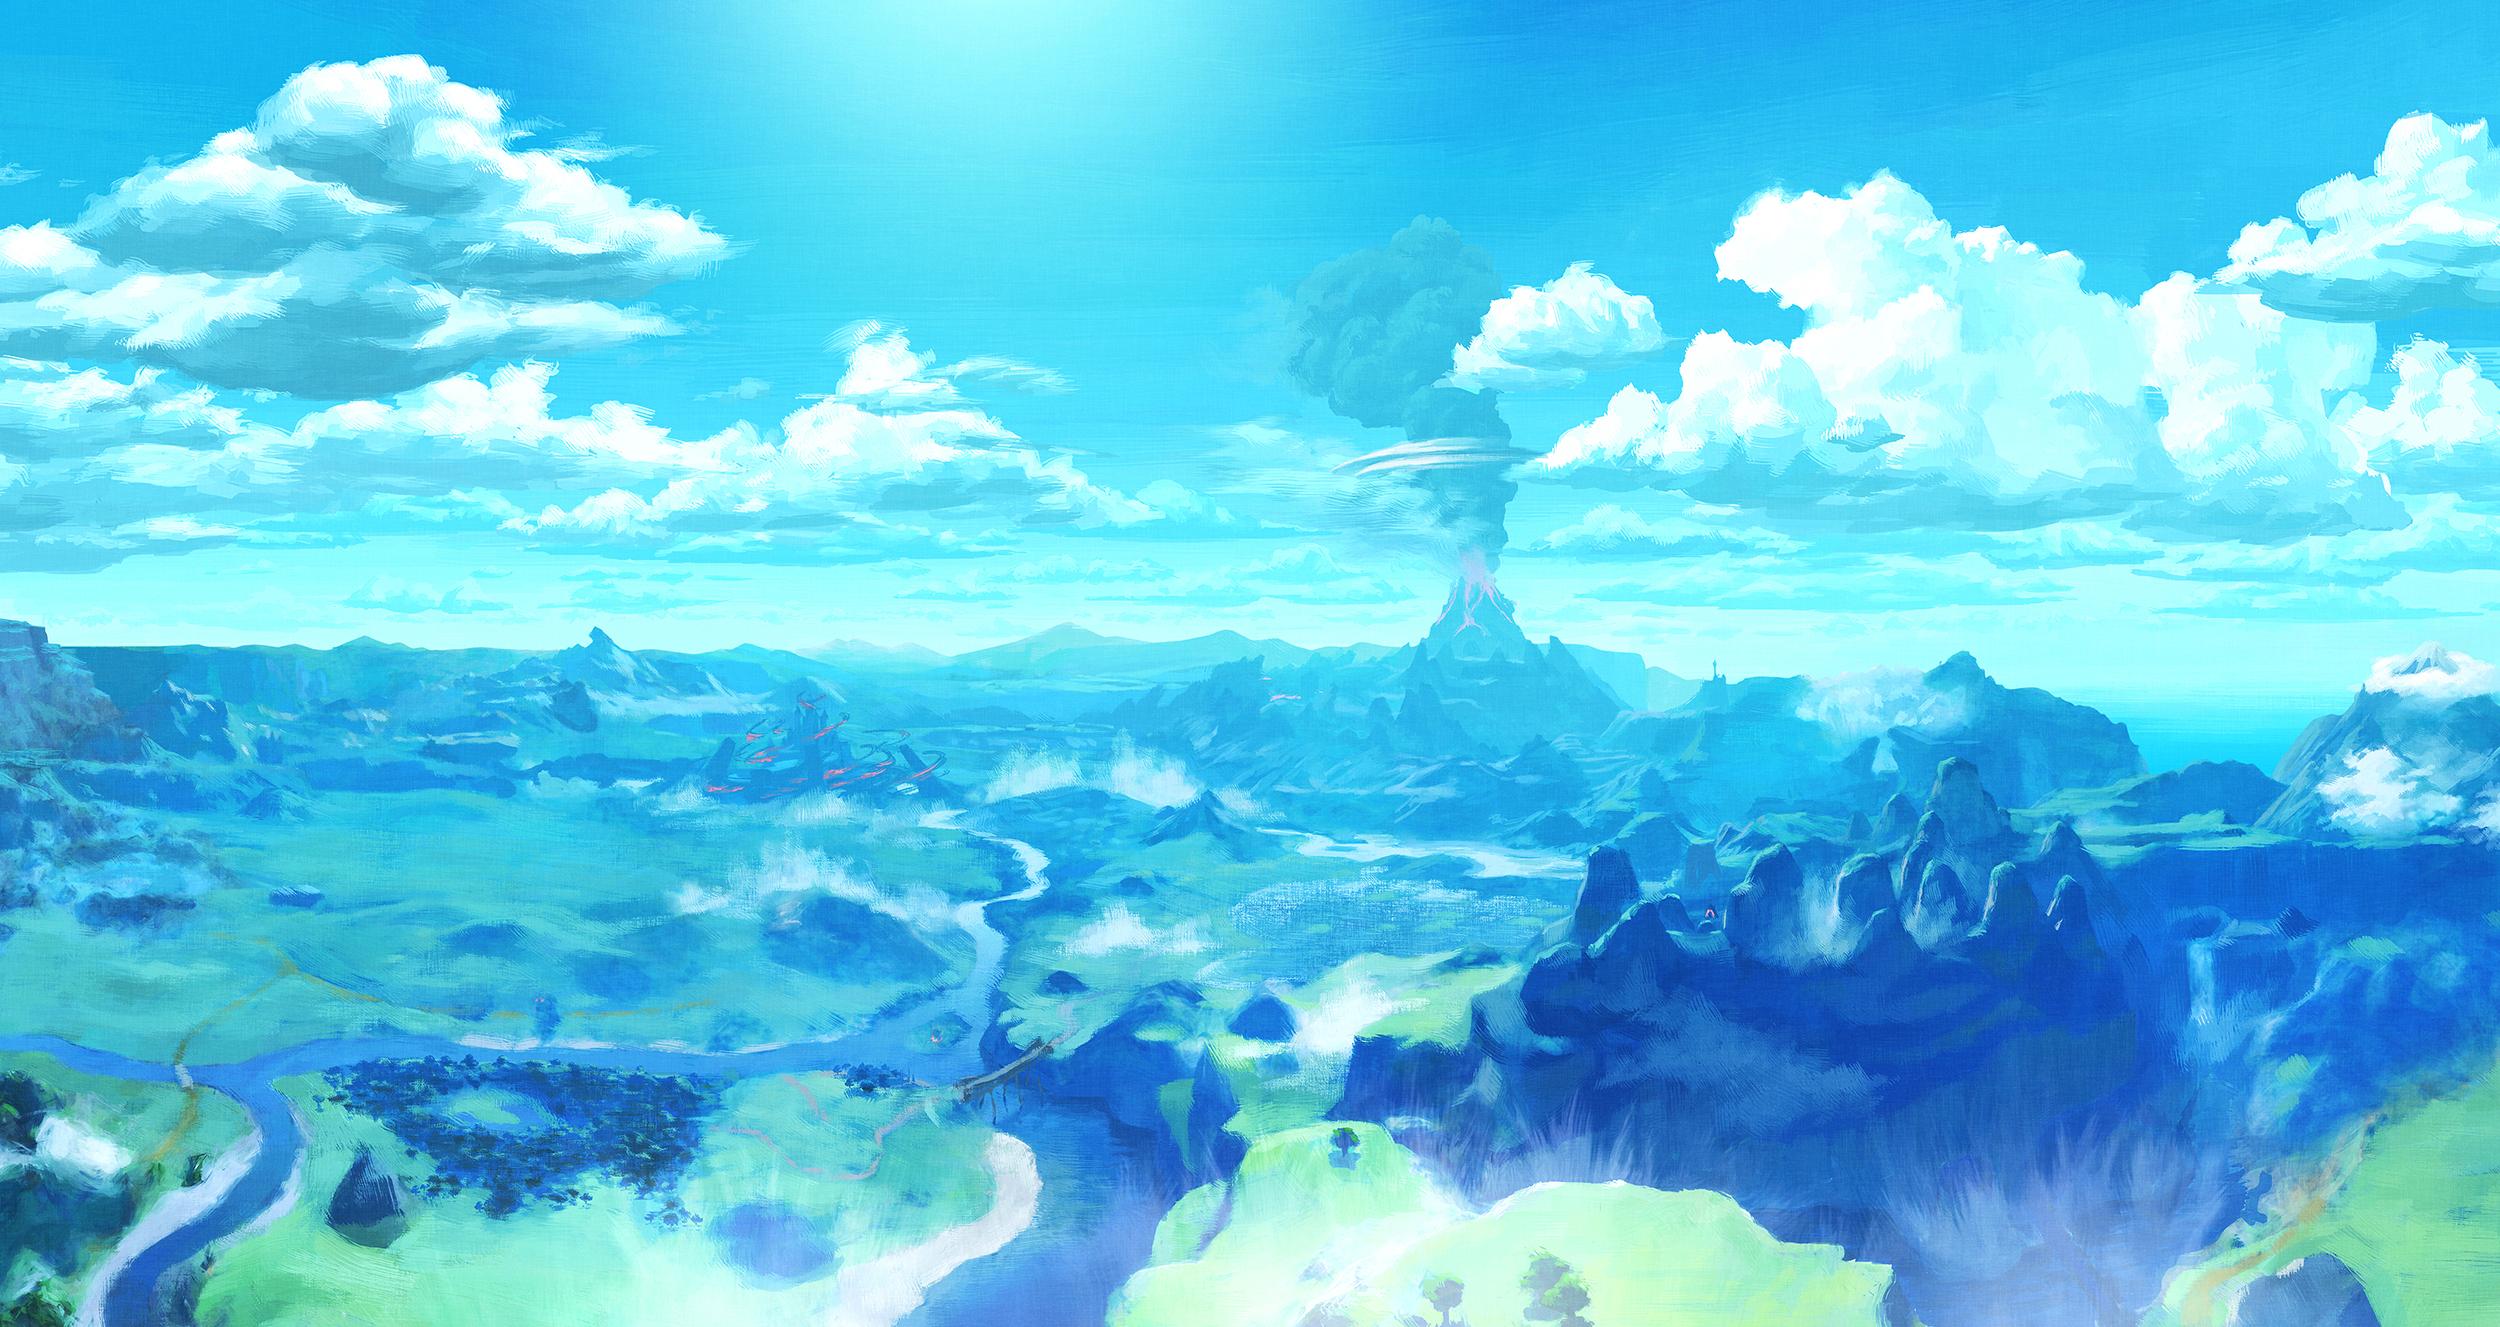 The Legend of Zelda: Breath of the Wild image 54